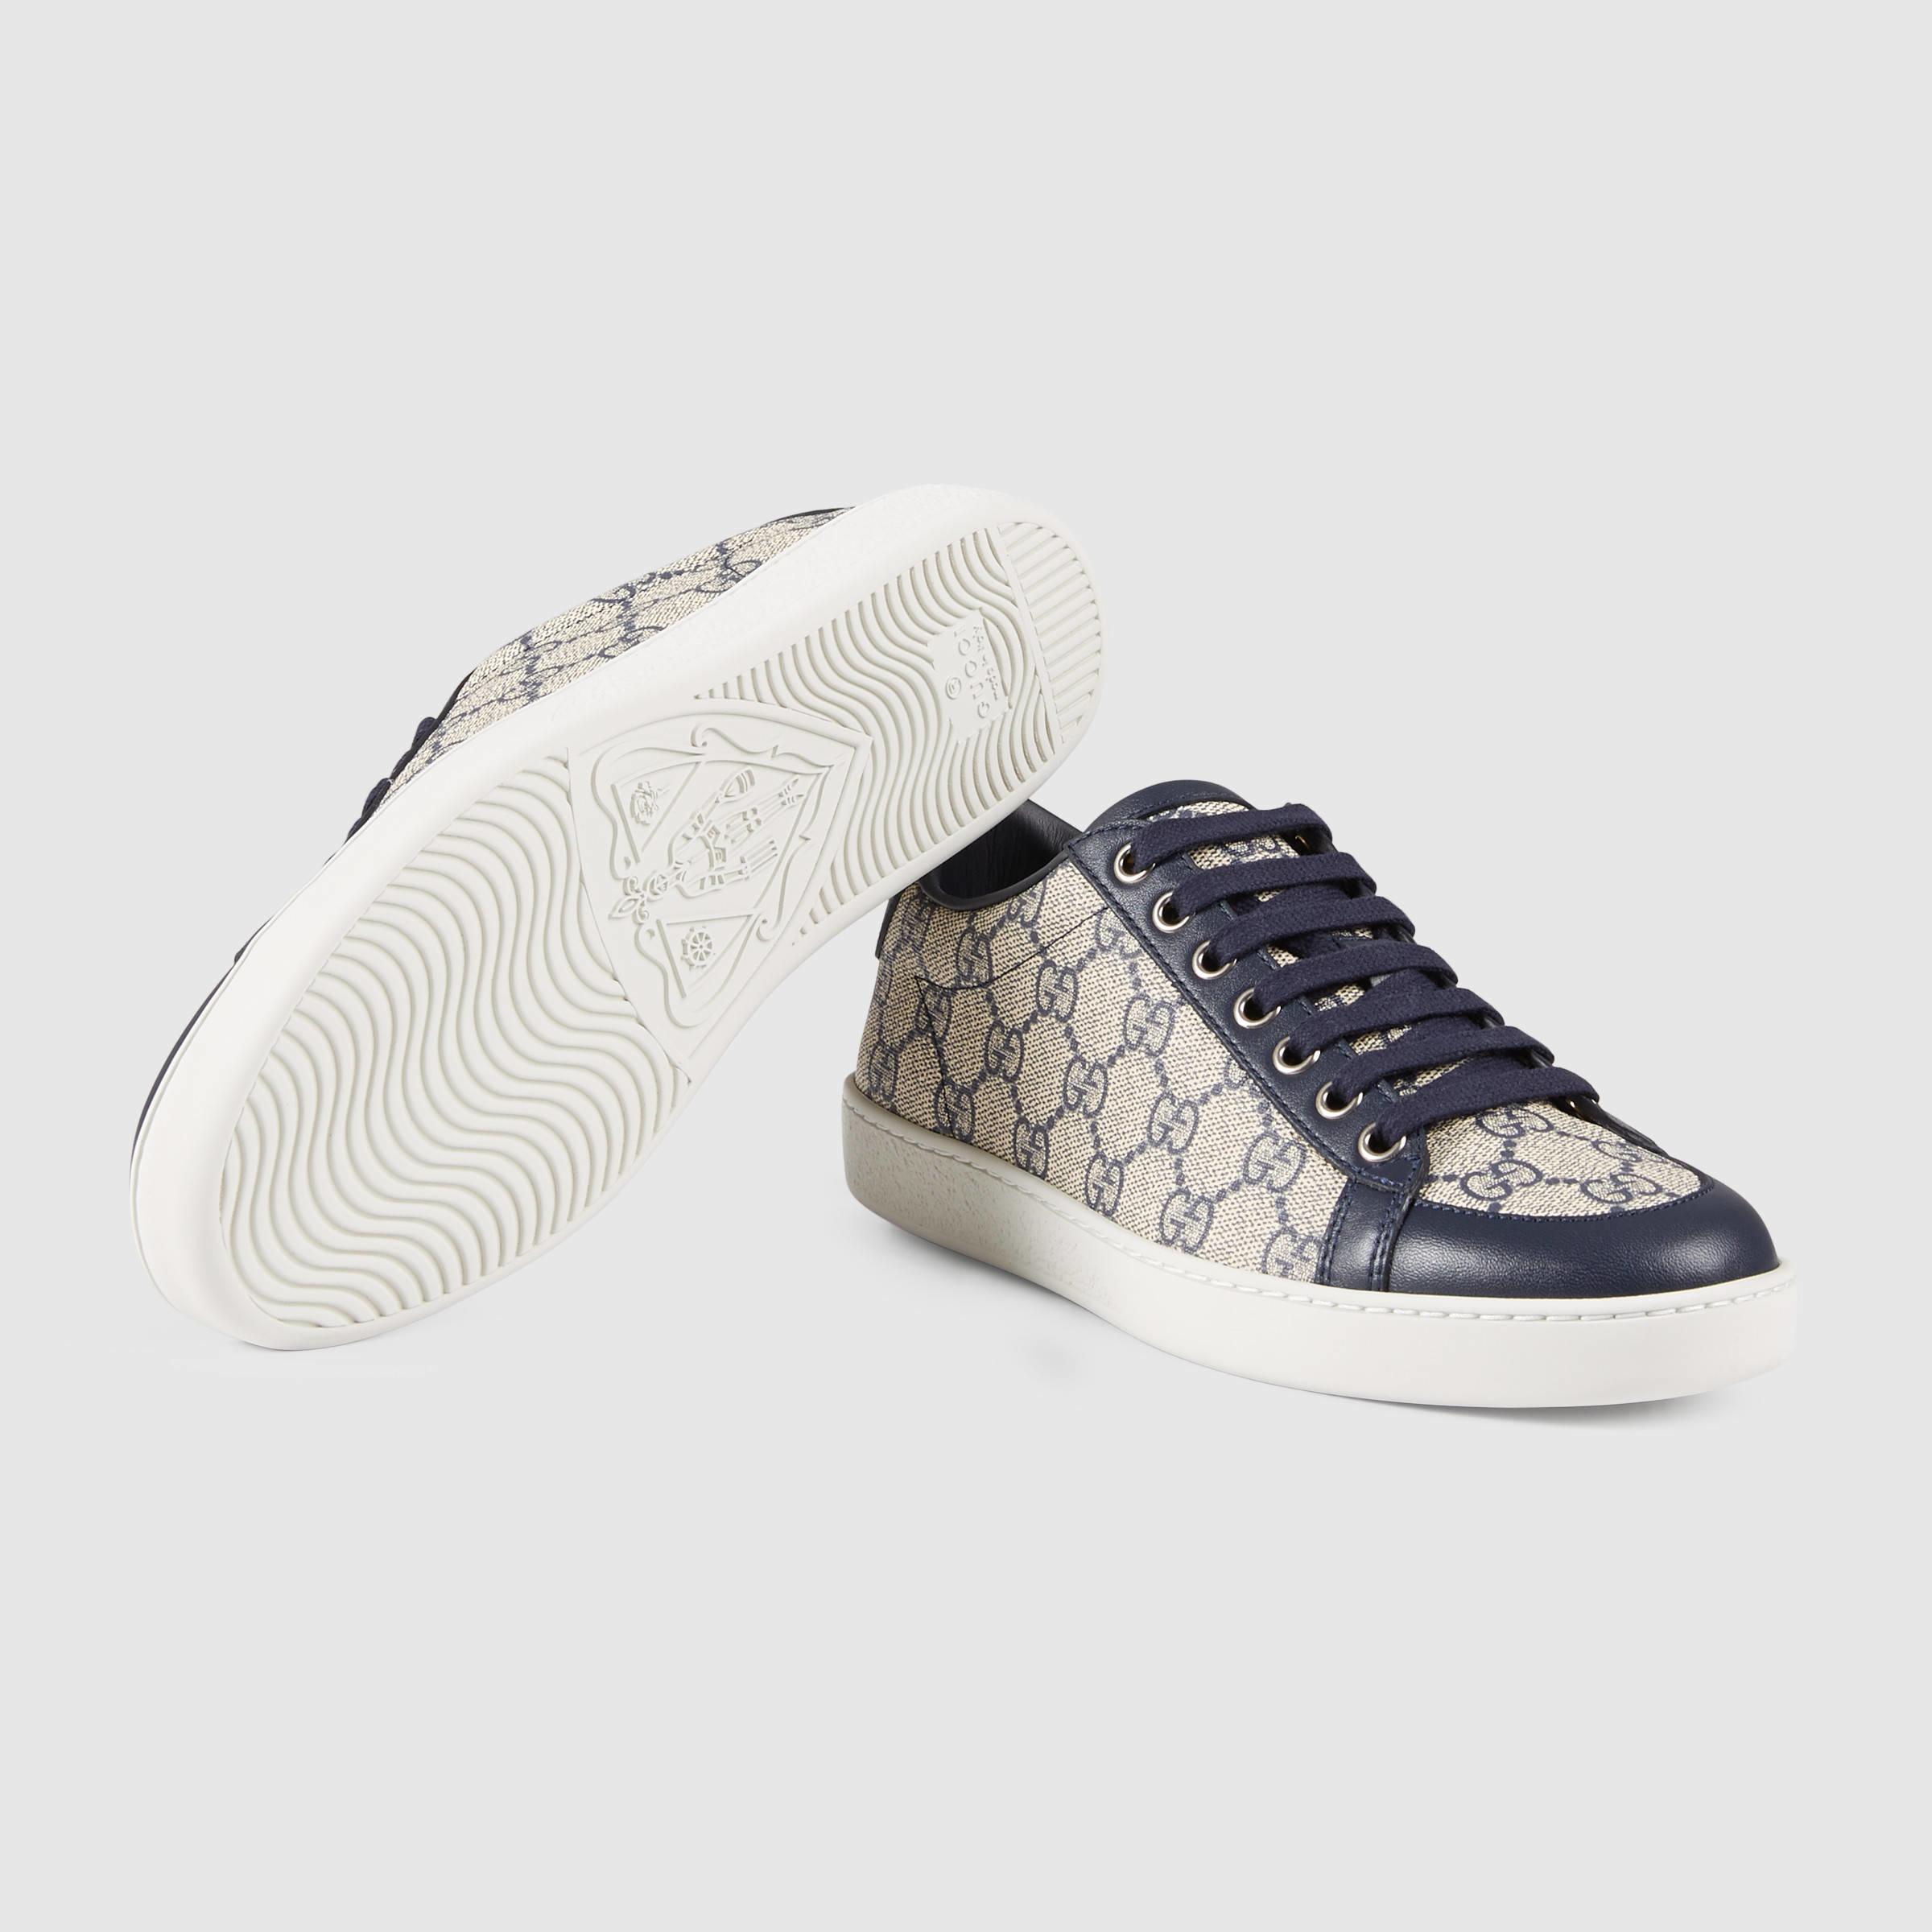 52636273732 Lyst - Gucci Brooklyn GG Supreme Sneaker in Blue